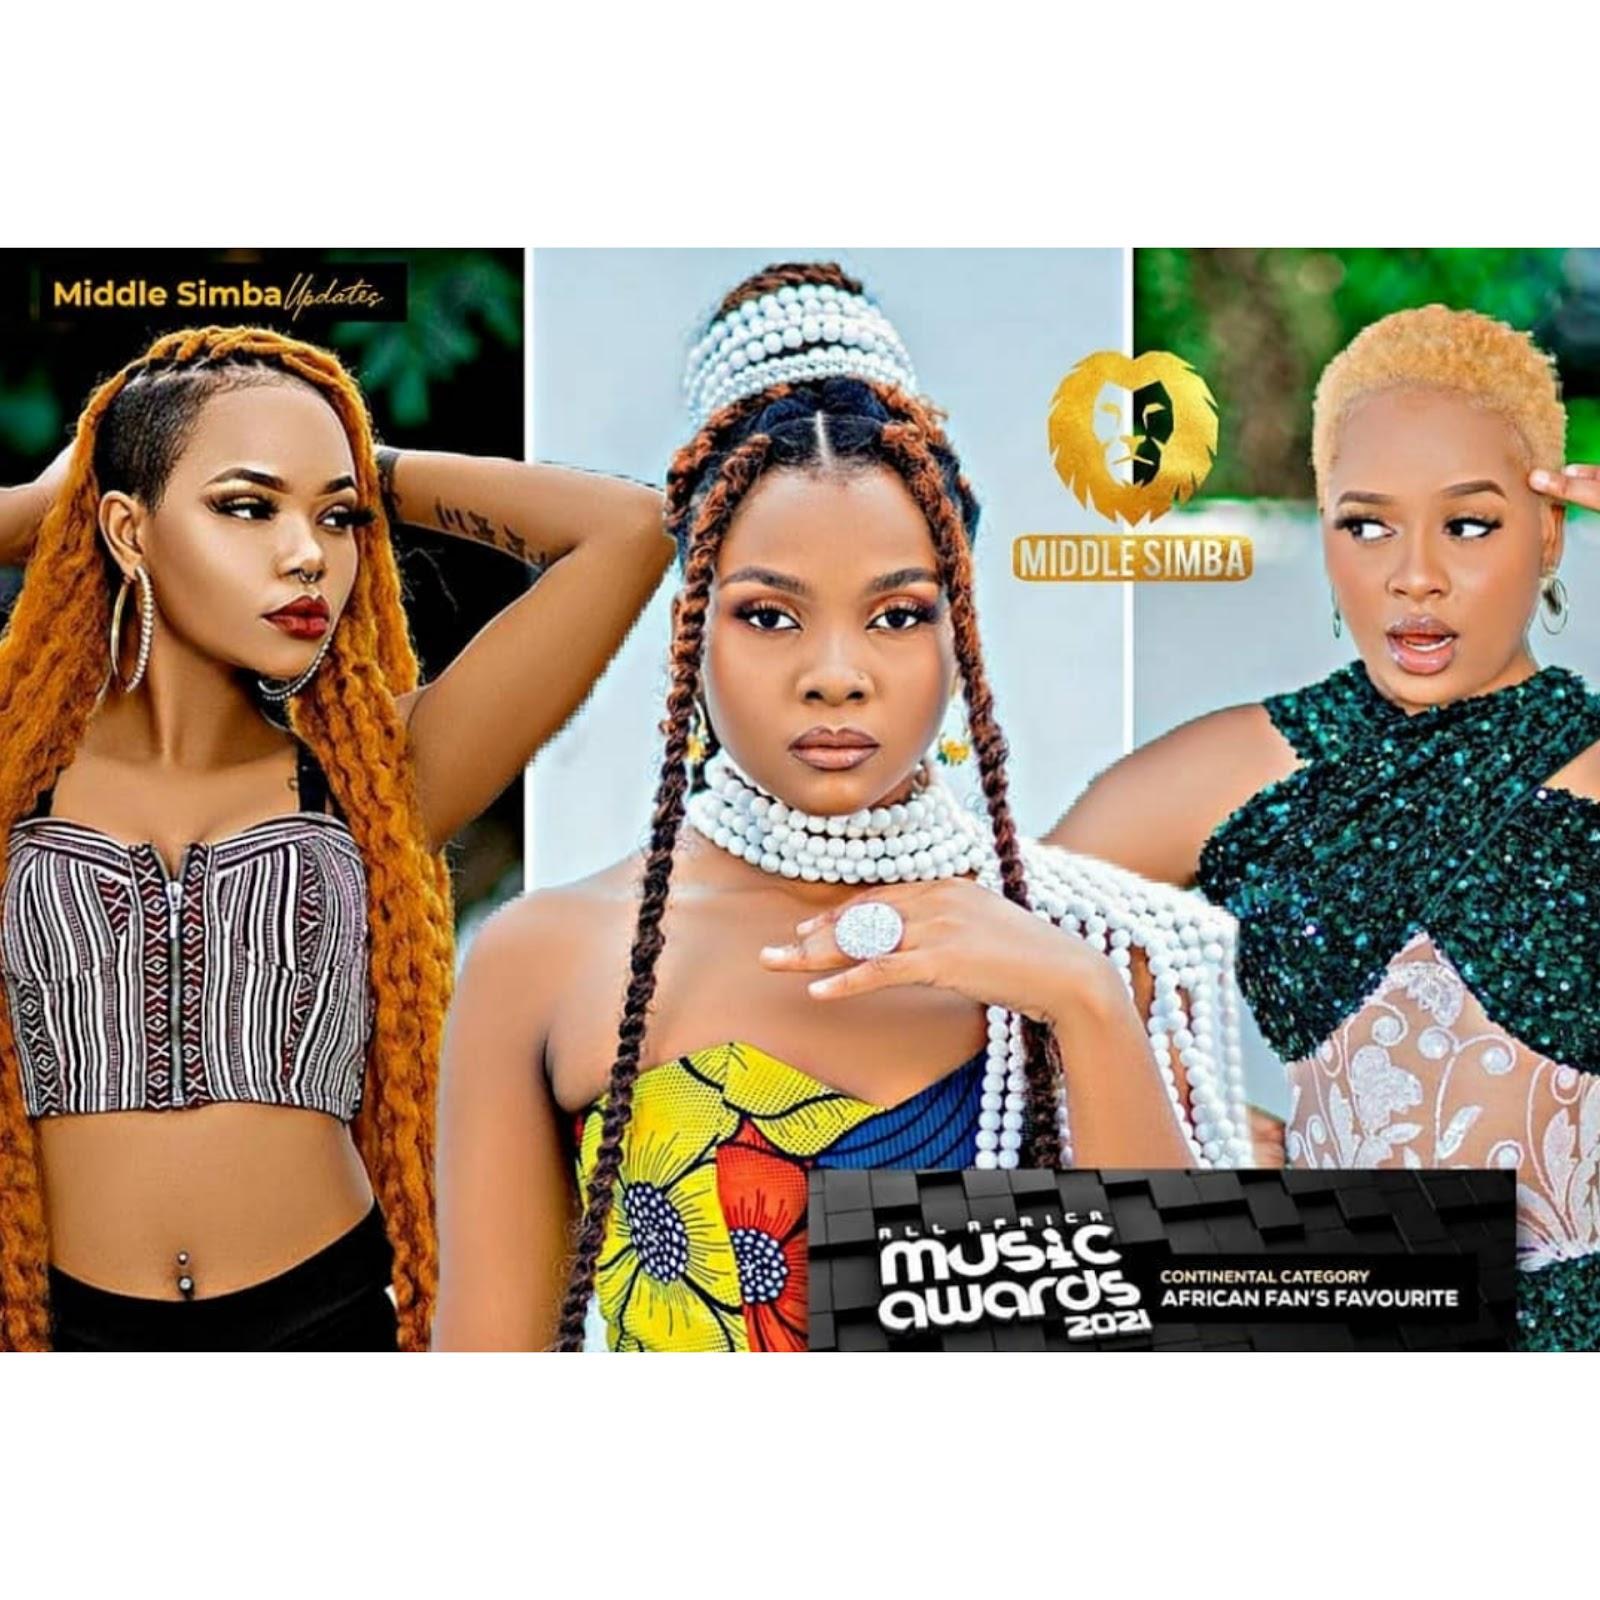 Nandy, Rosa Ree na Zuchu Ndani ya Afrima Awards, Rosa Ree Aongoza Nominations